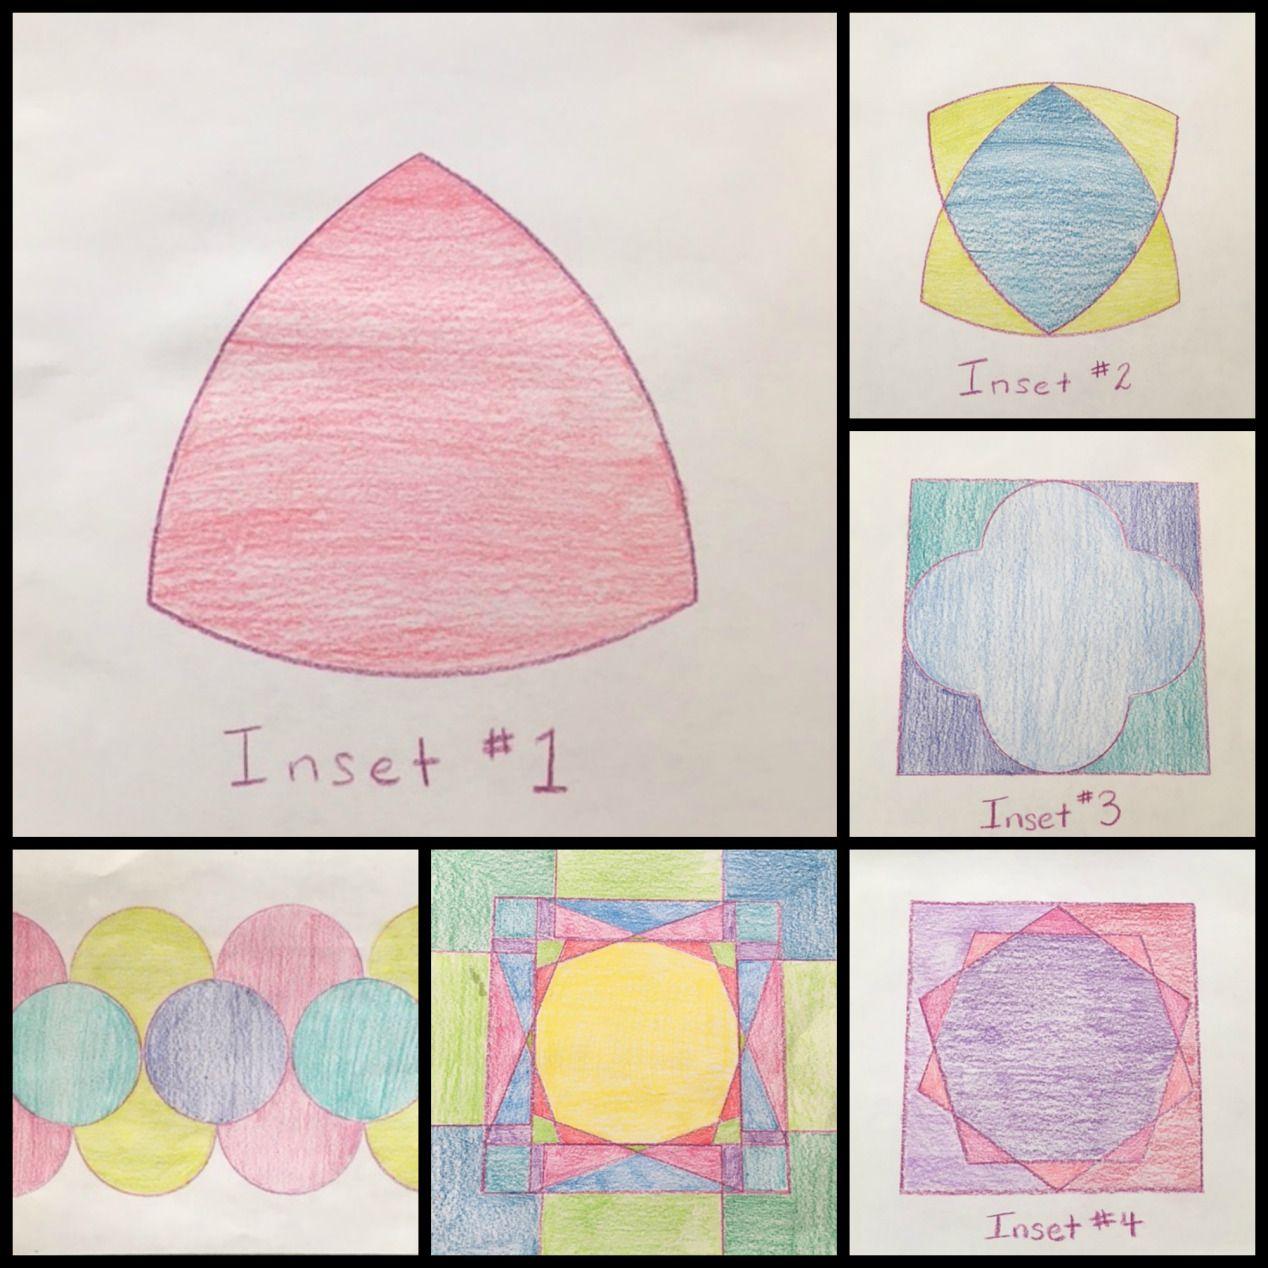 Montessori Materials Snapshots Insets Part 2